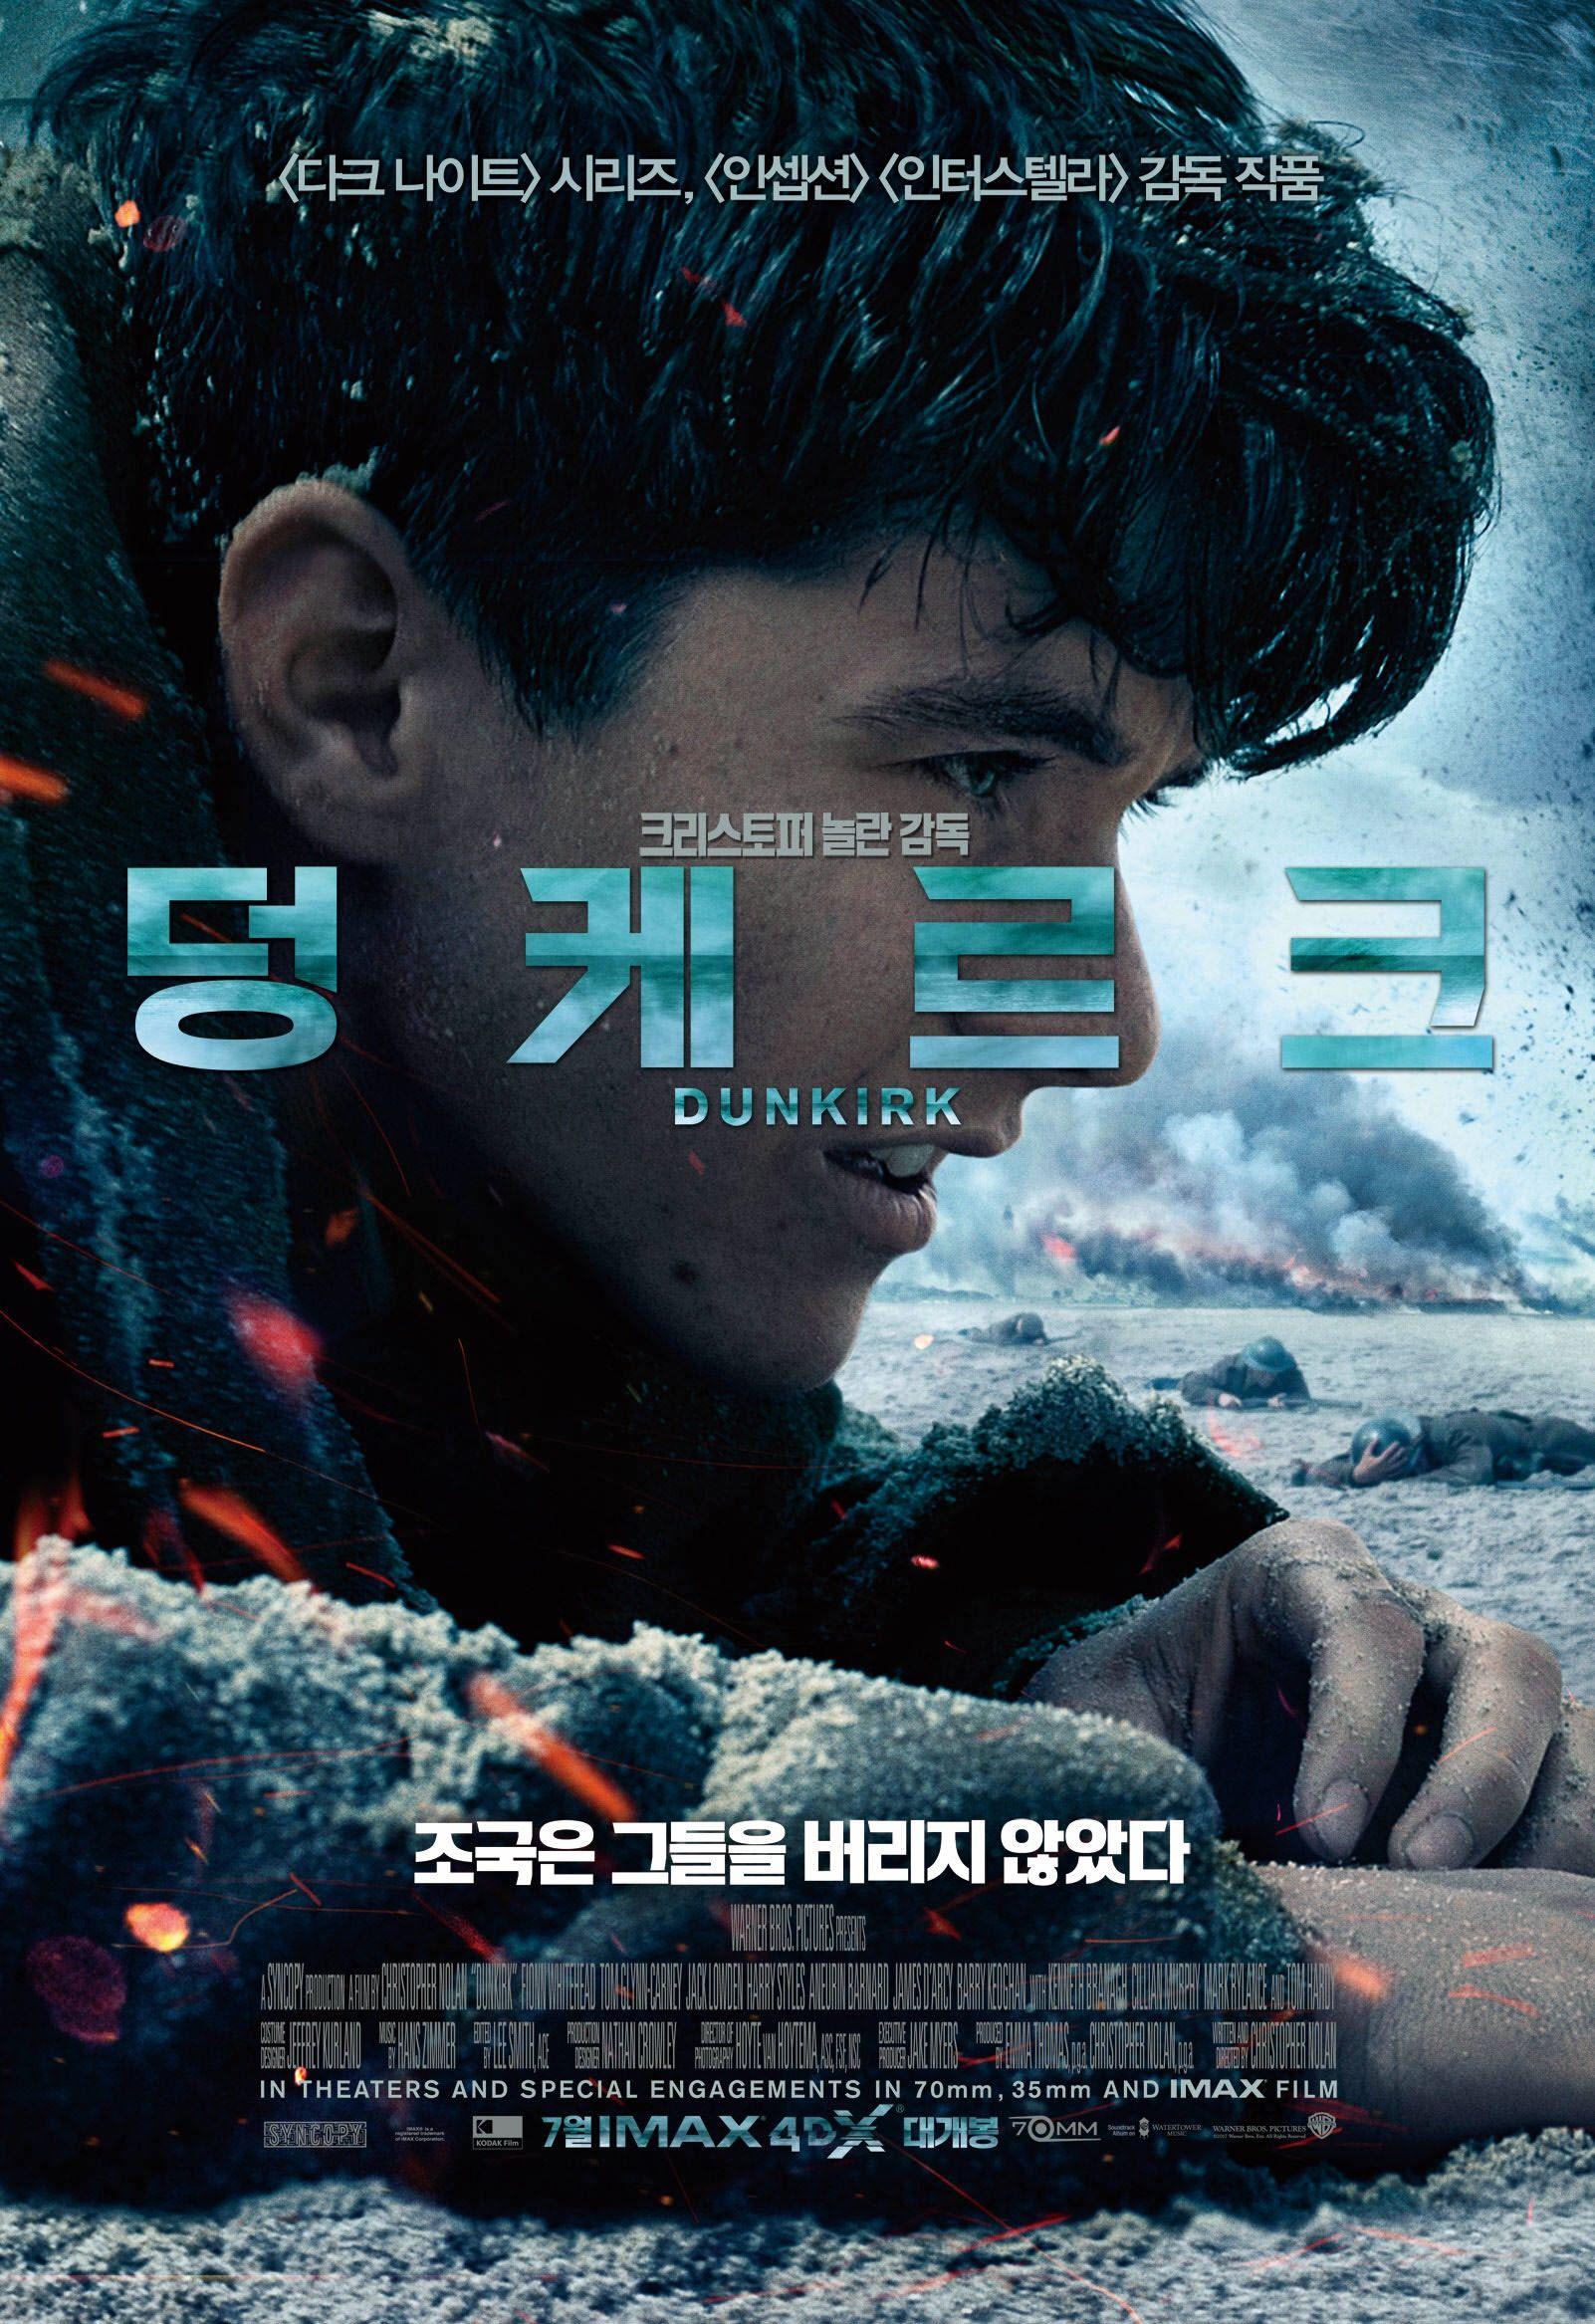 DUNKIRK '덩케르크' 20170720 Dunkirk, Dunkirk movie, Japanese